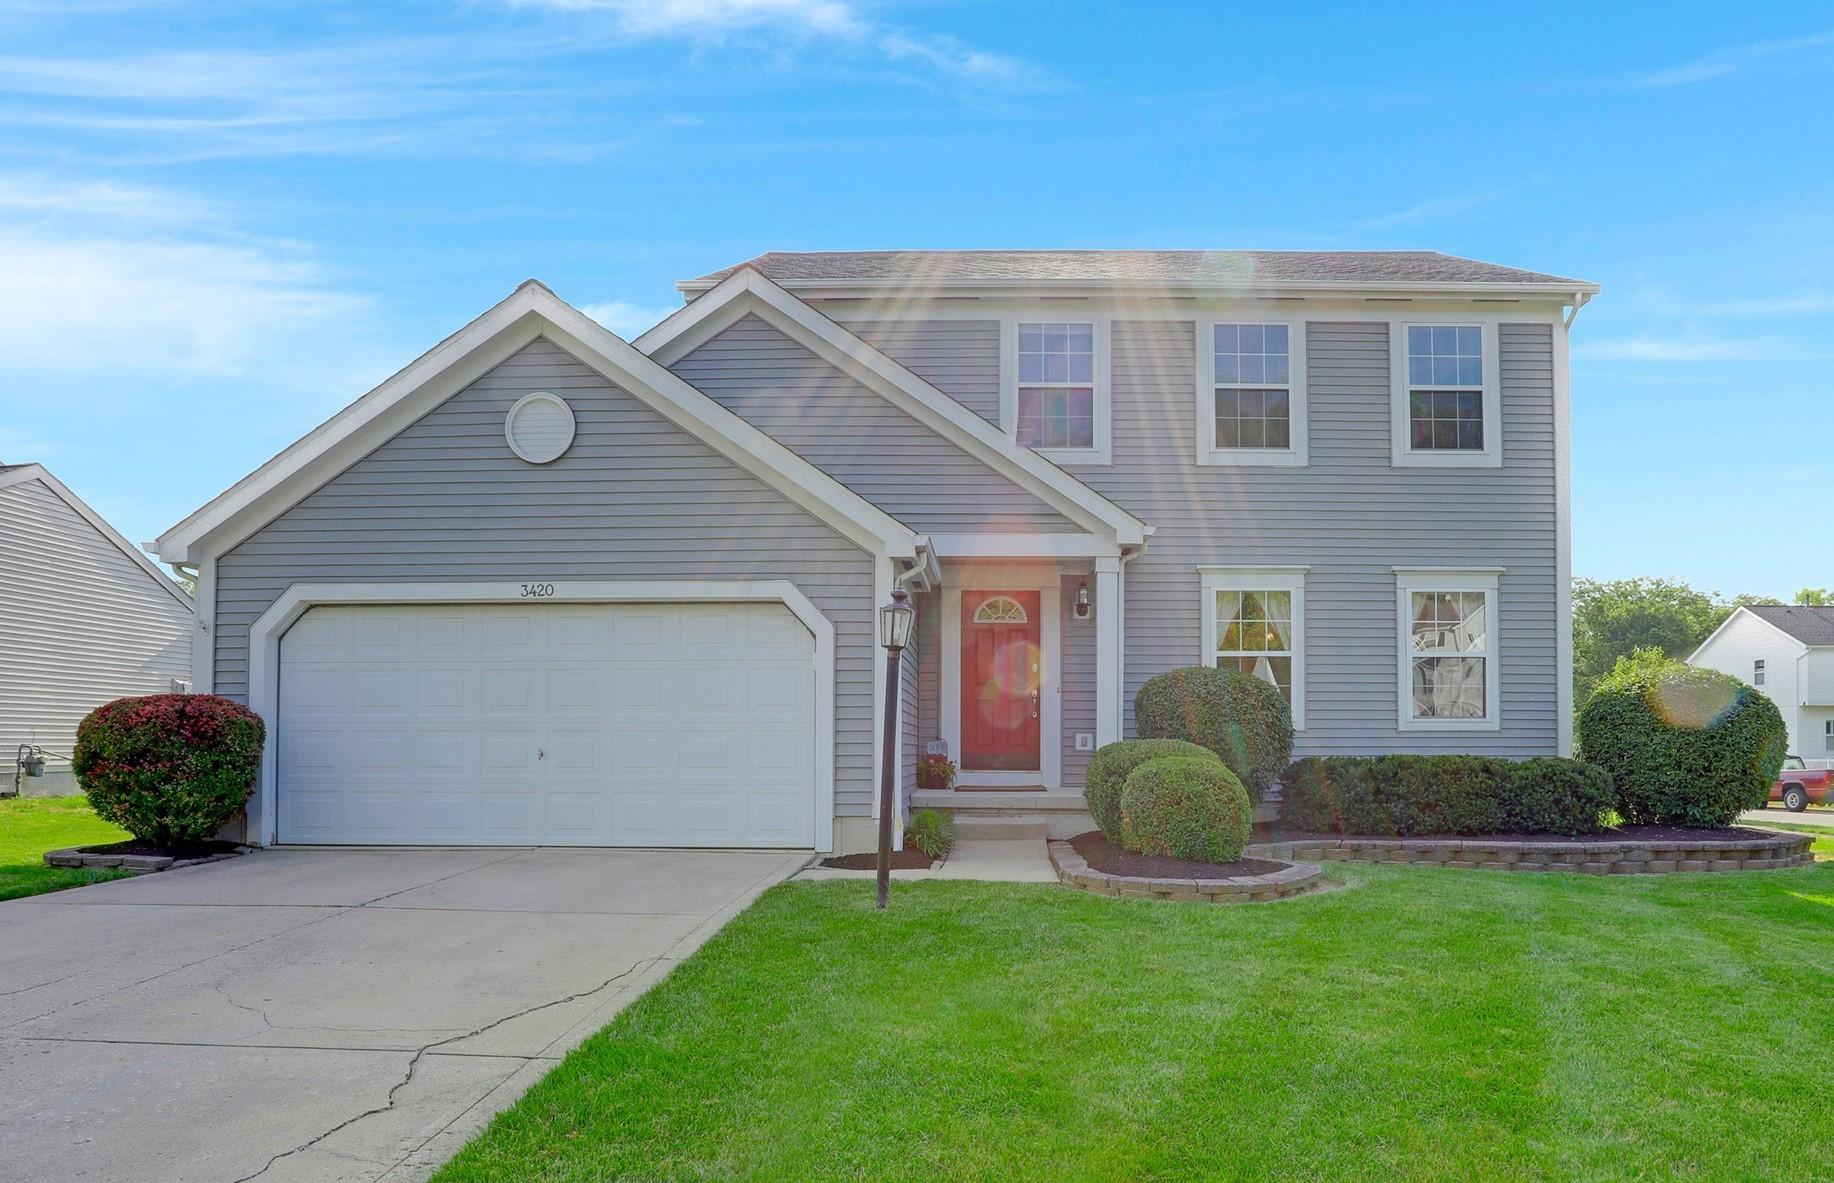 3420 Patcon Way, Hilliard, Ohio 43026, 4 Bedrooms Bedrooms, ,4 BathroomsBathrooms,Residential,For Sale,Patcon,220020250